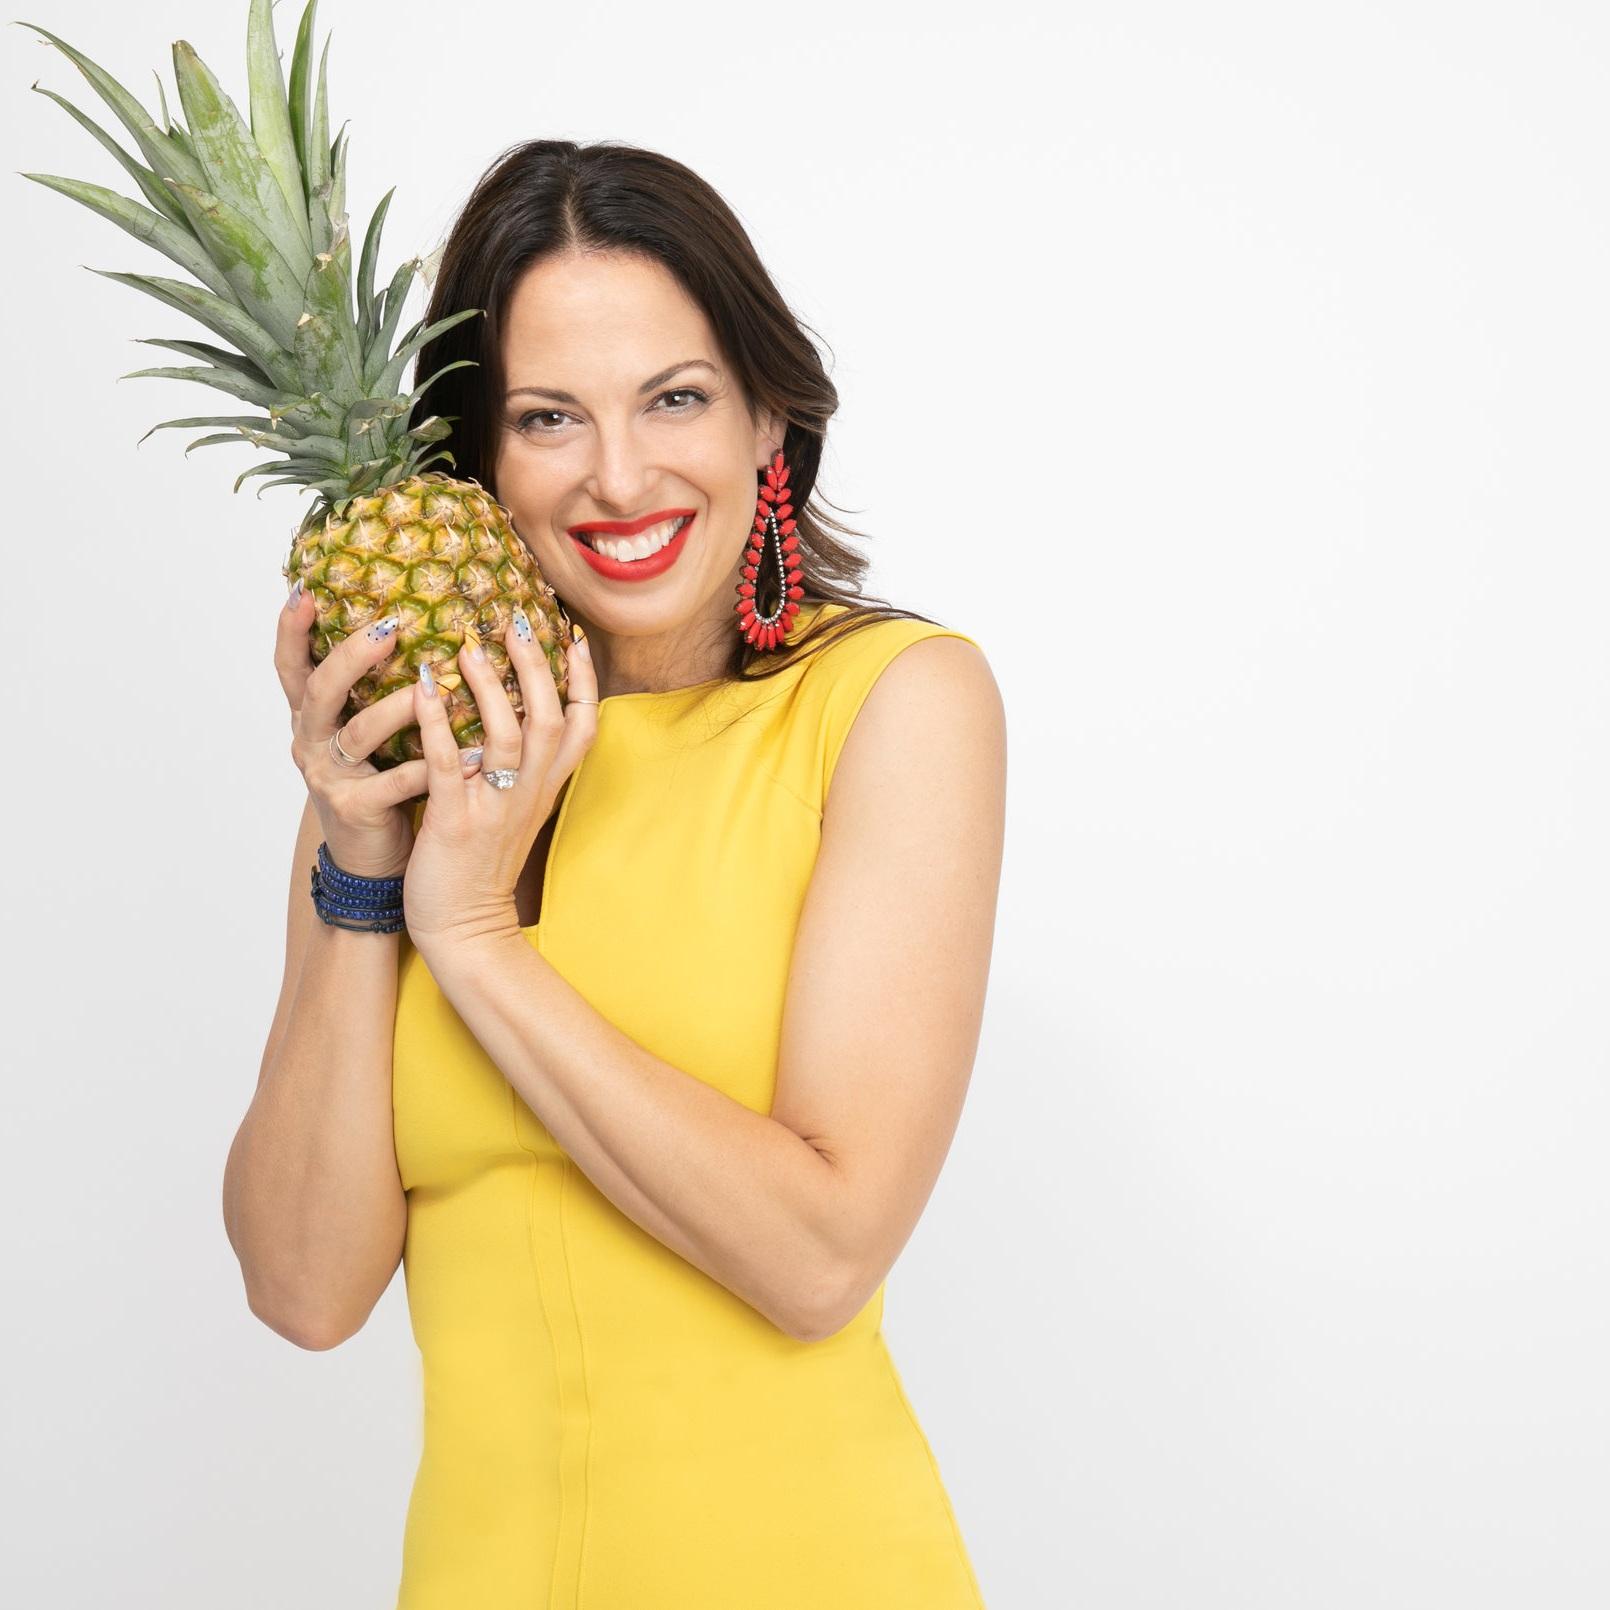 Christine Cole is #Flaweless - Hospitality guru, stunning chef, and whimsical sommelier